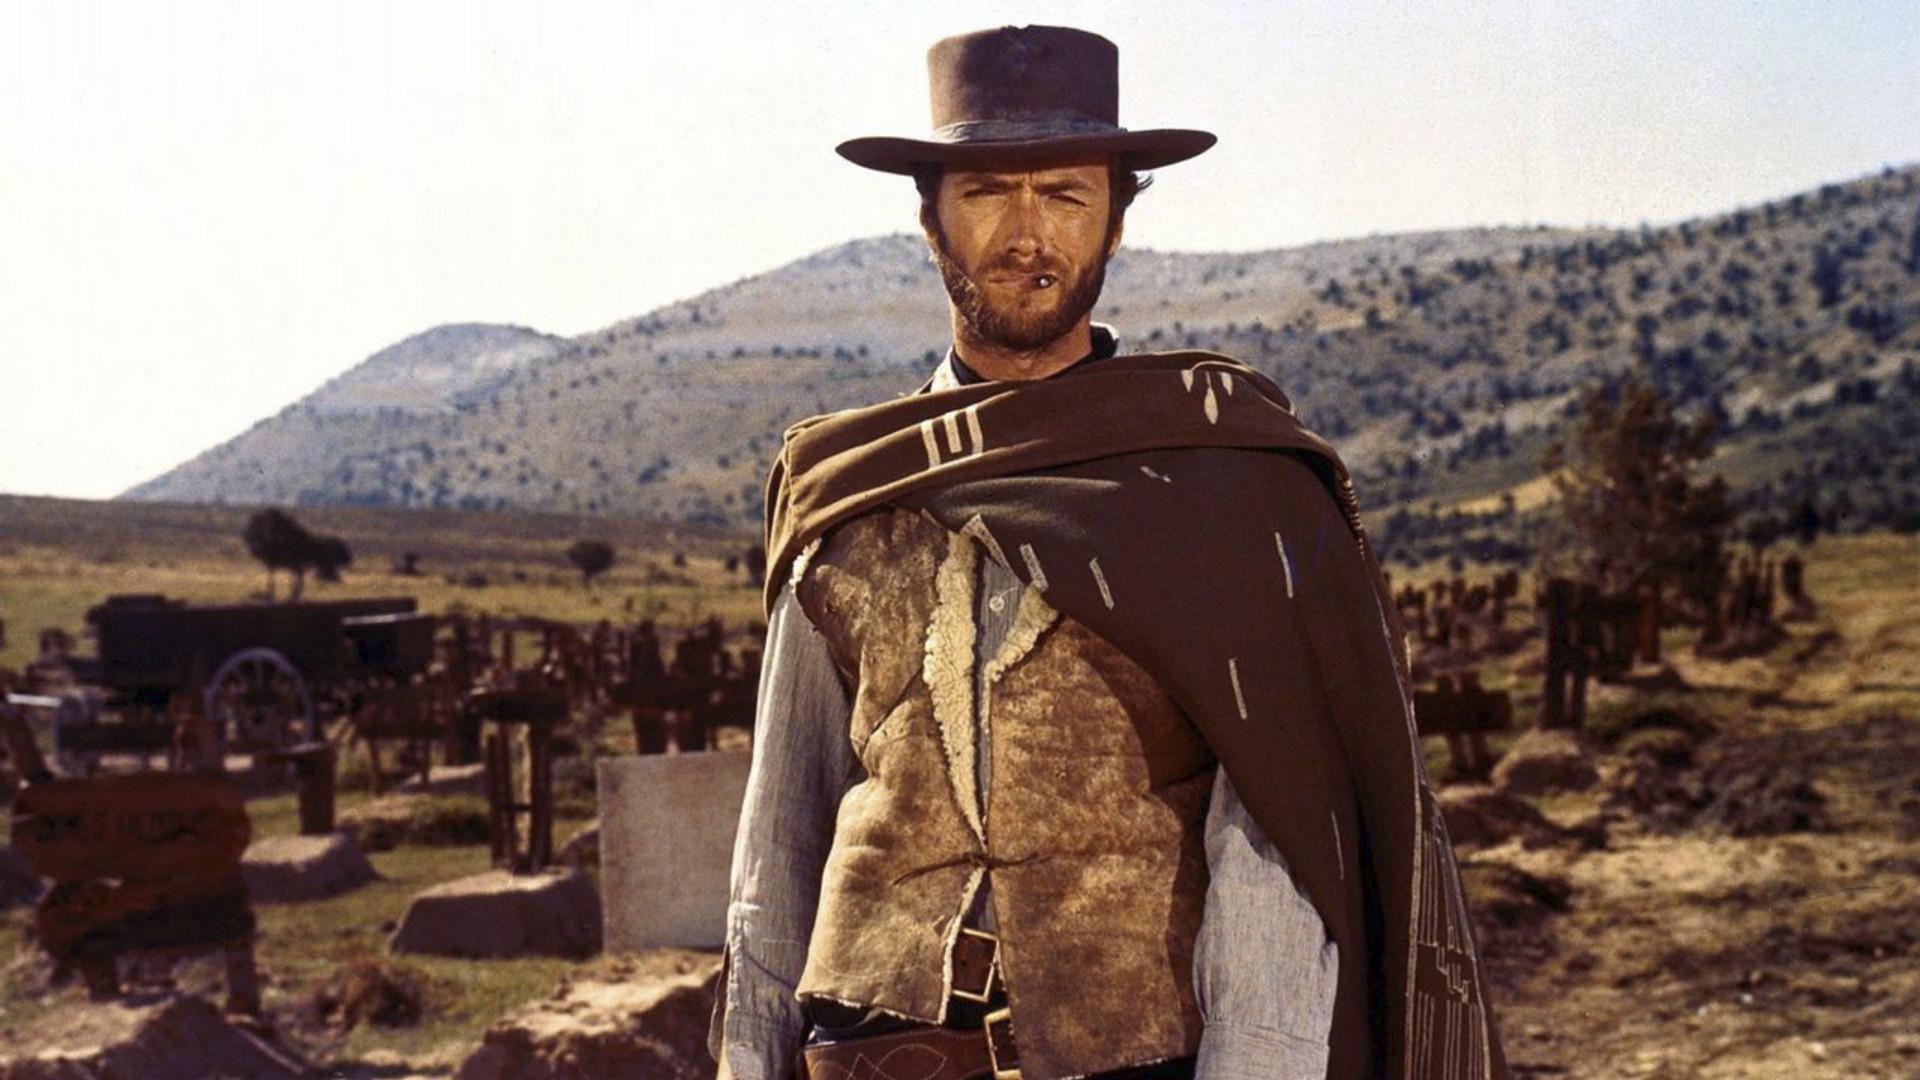 Clint Eastwood, una estimulante anomalía